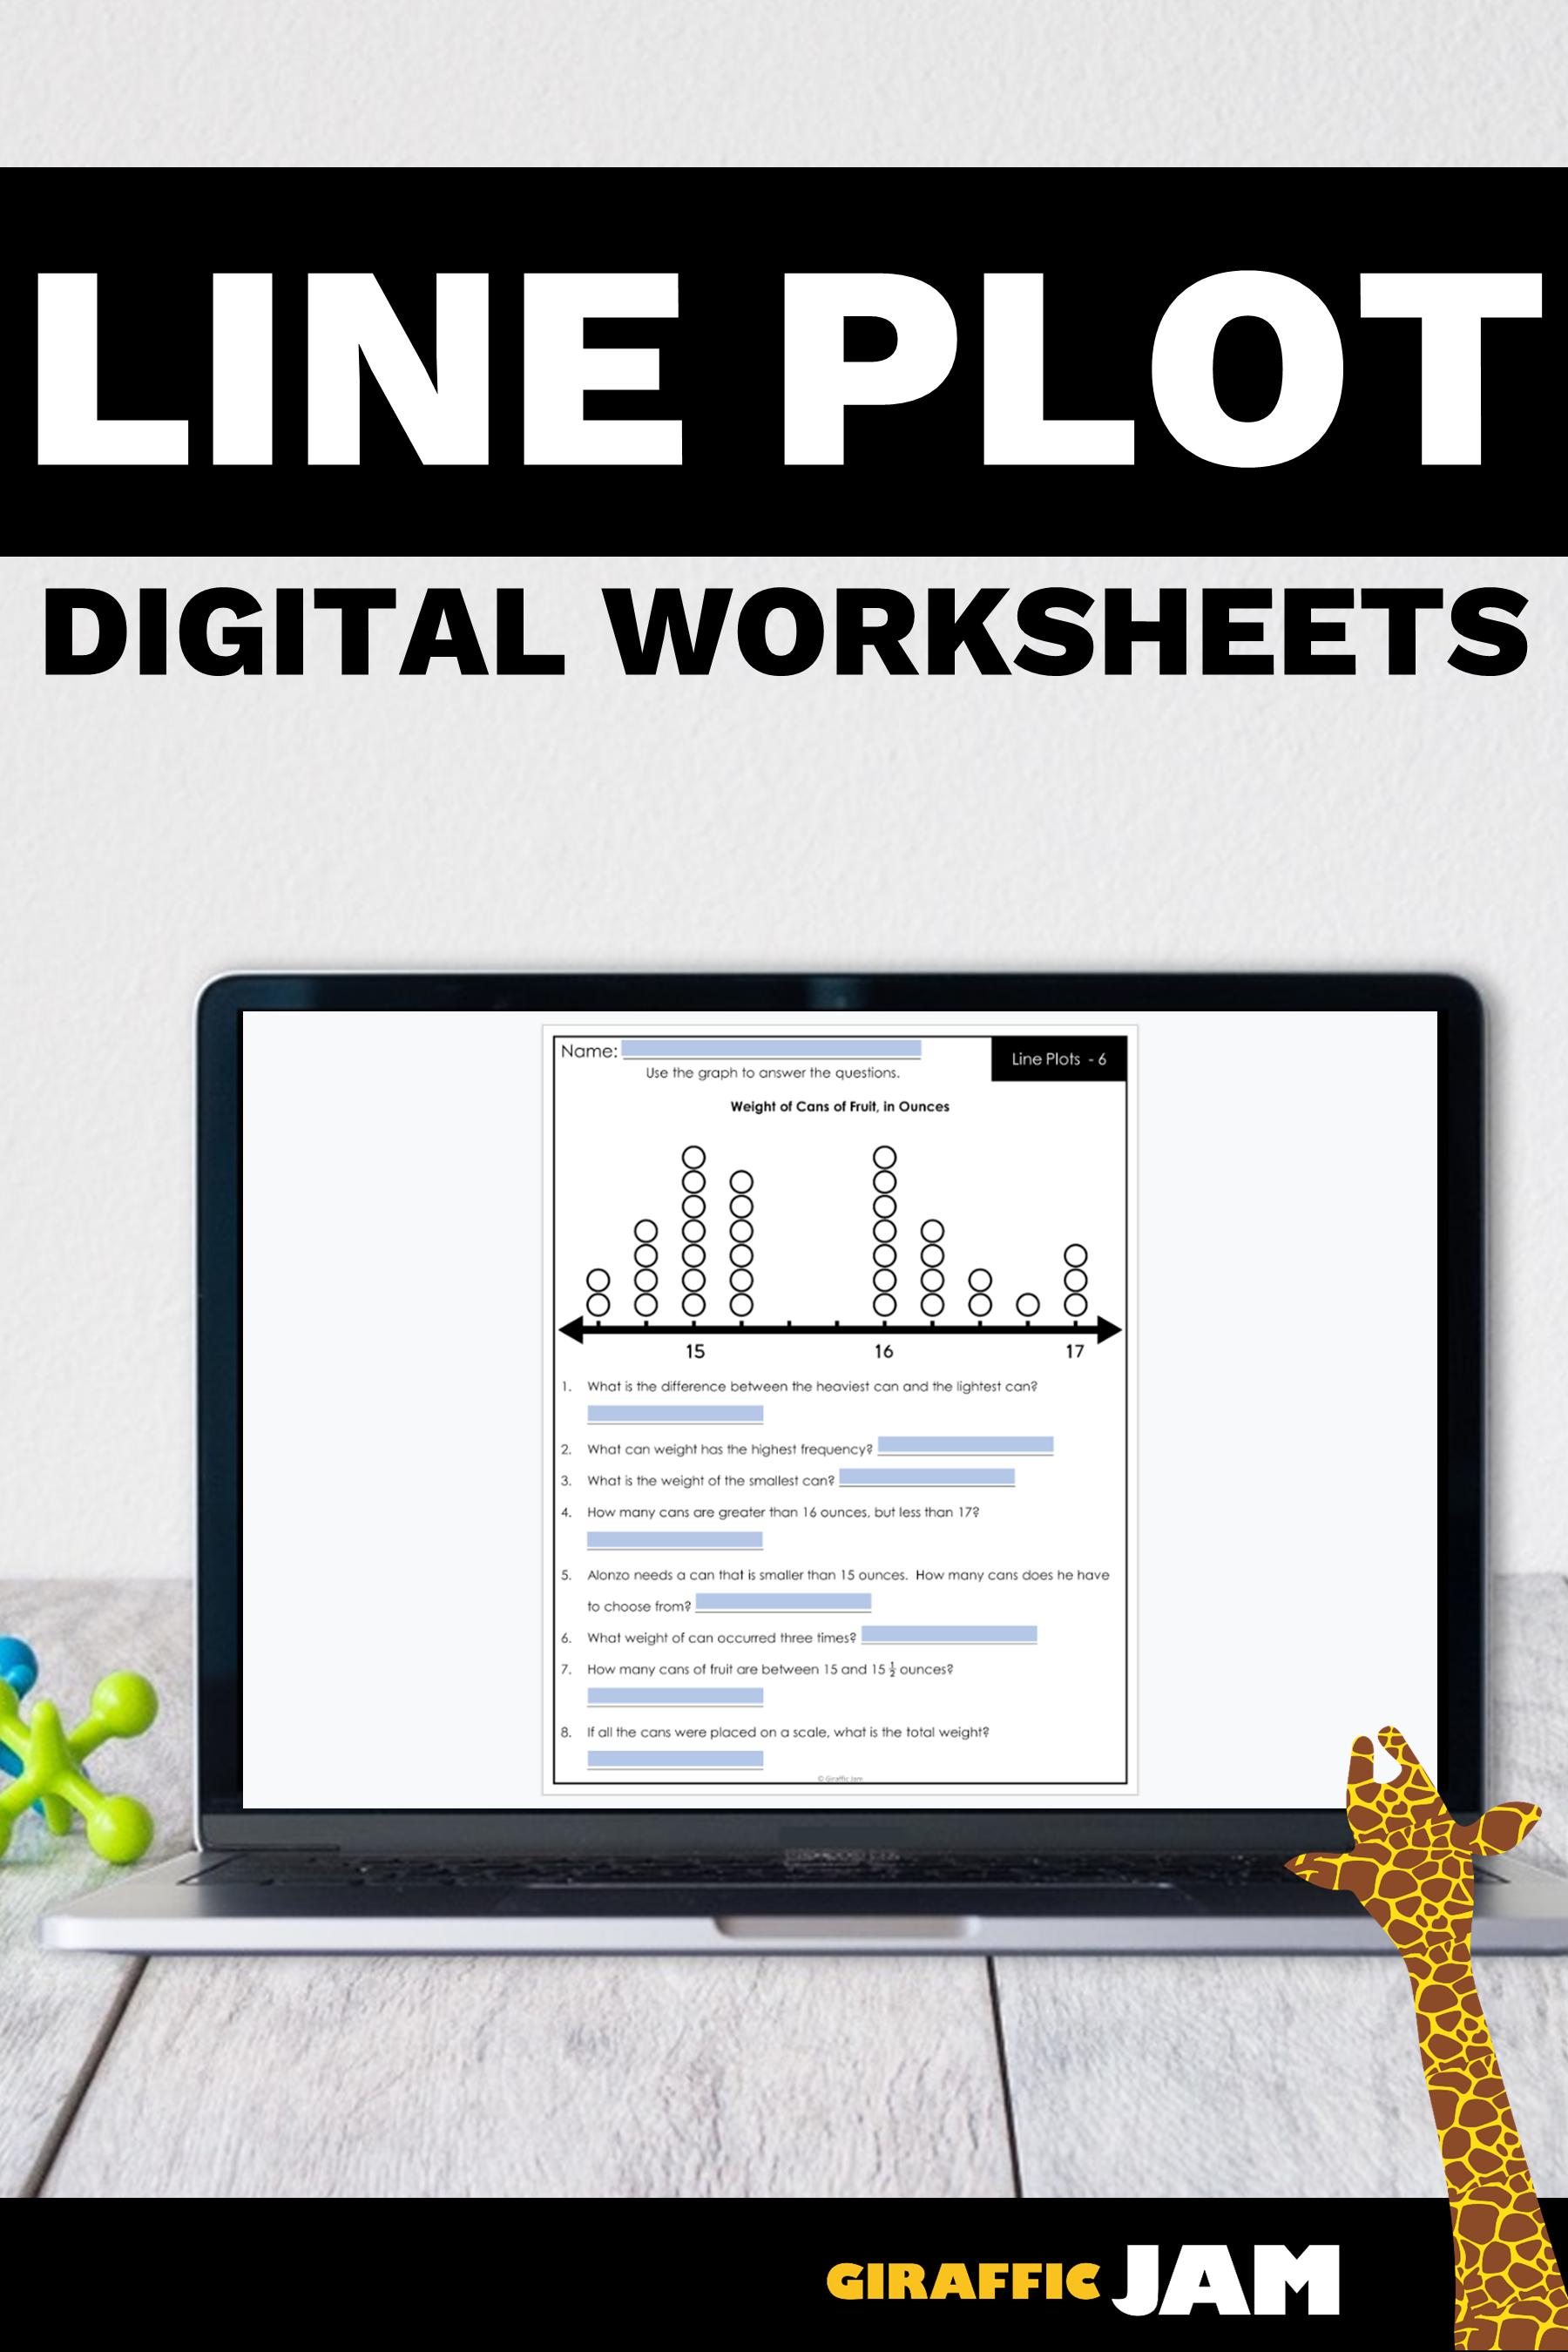 4th Grade Measurement Measurement Worksheets Line Plots Interpreting Line Plots Google Classroom Activities Line Plot Worksheets Measurement Activities [ 2700 x 1800 Pixel ]